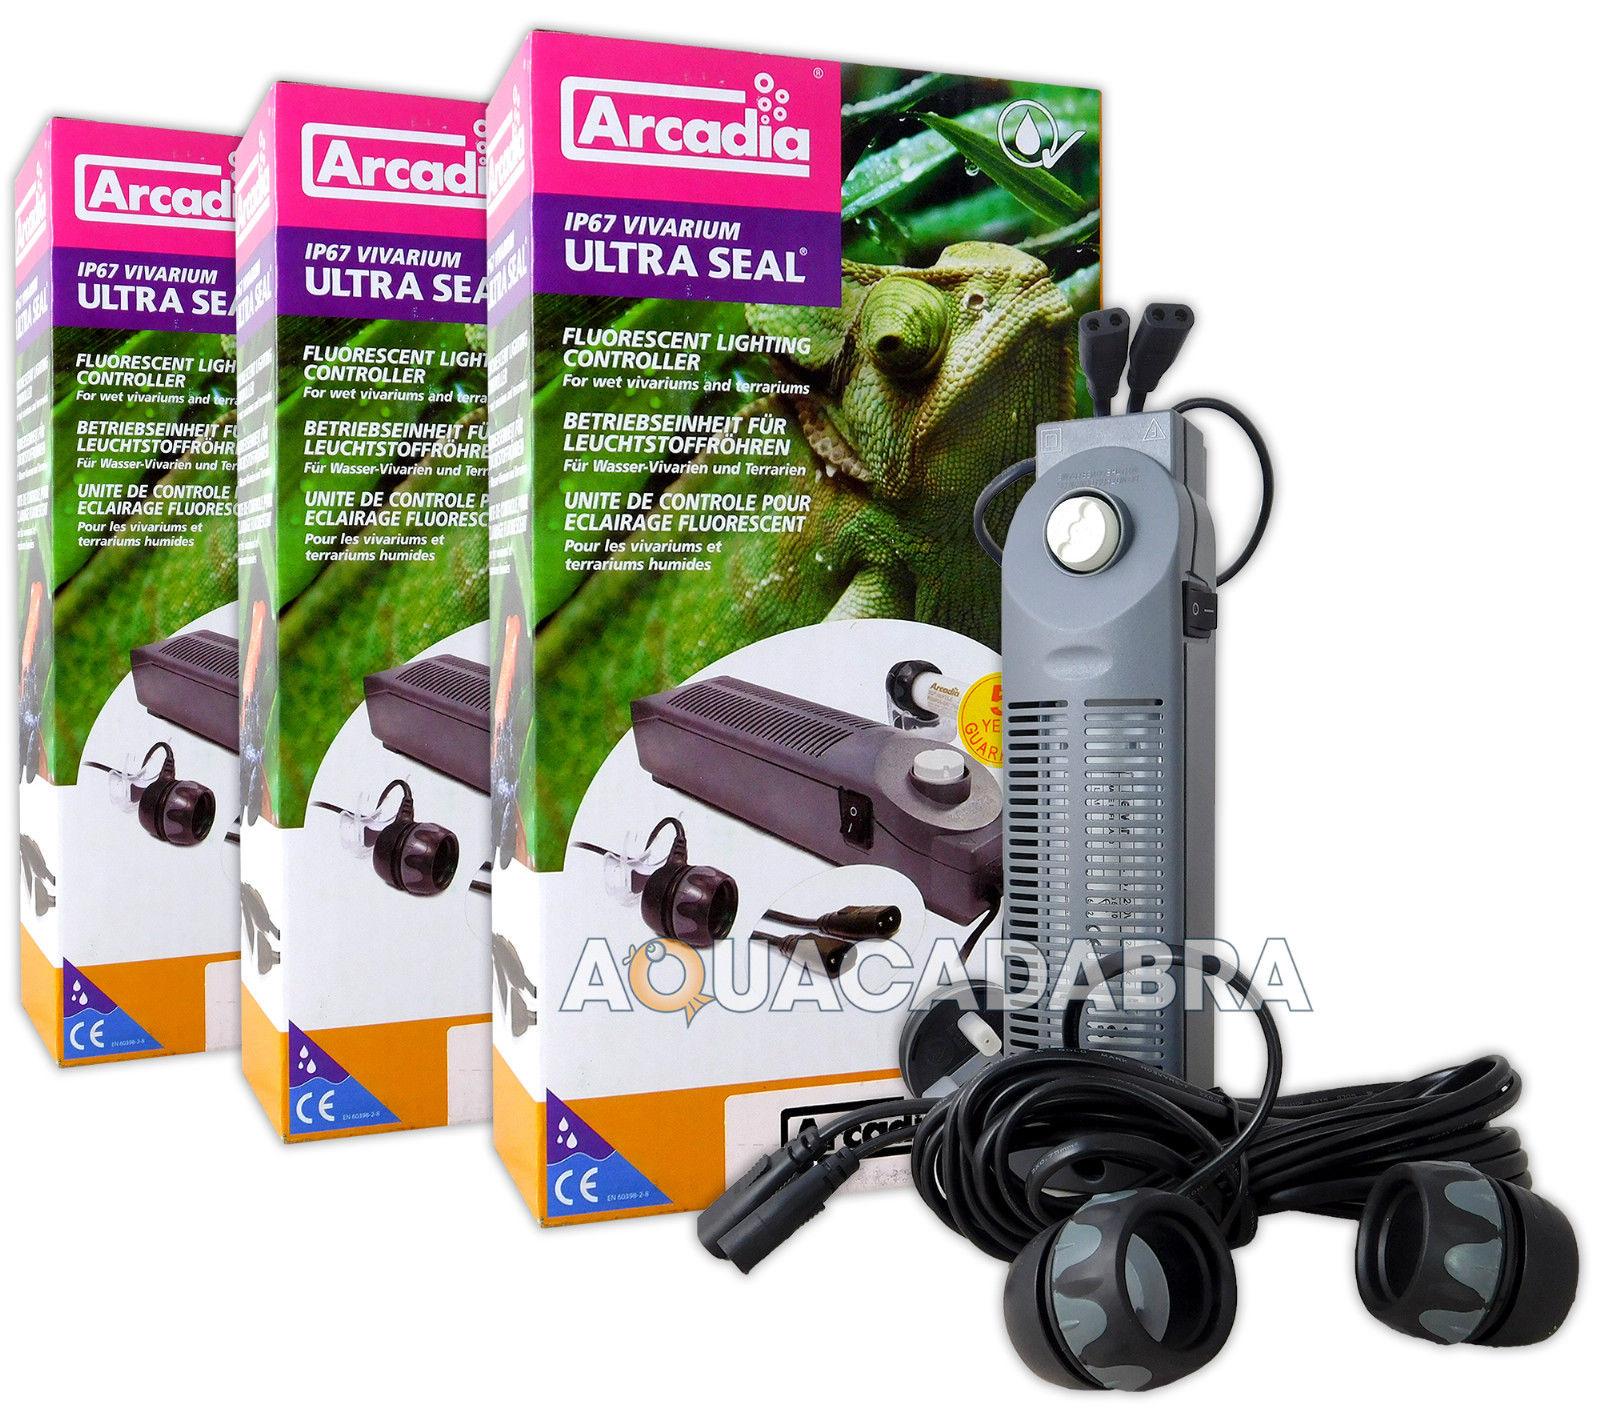 Arcadia T5 T8 Ultra Seal Lamp Controller Ip67 Light: ARCADIA ULTRA SEAL T8 FLUORESCENT LIGHTING CONTROLLER IP67